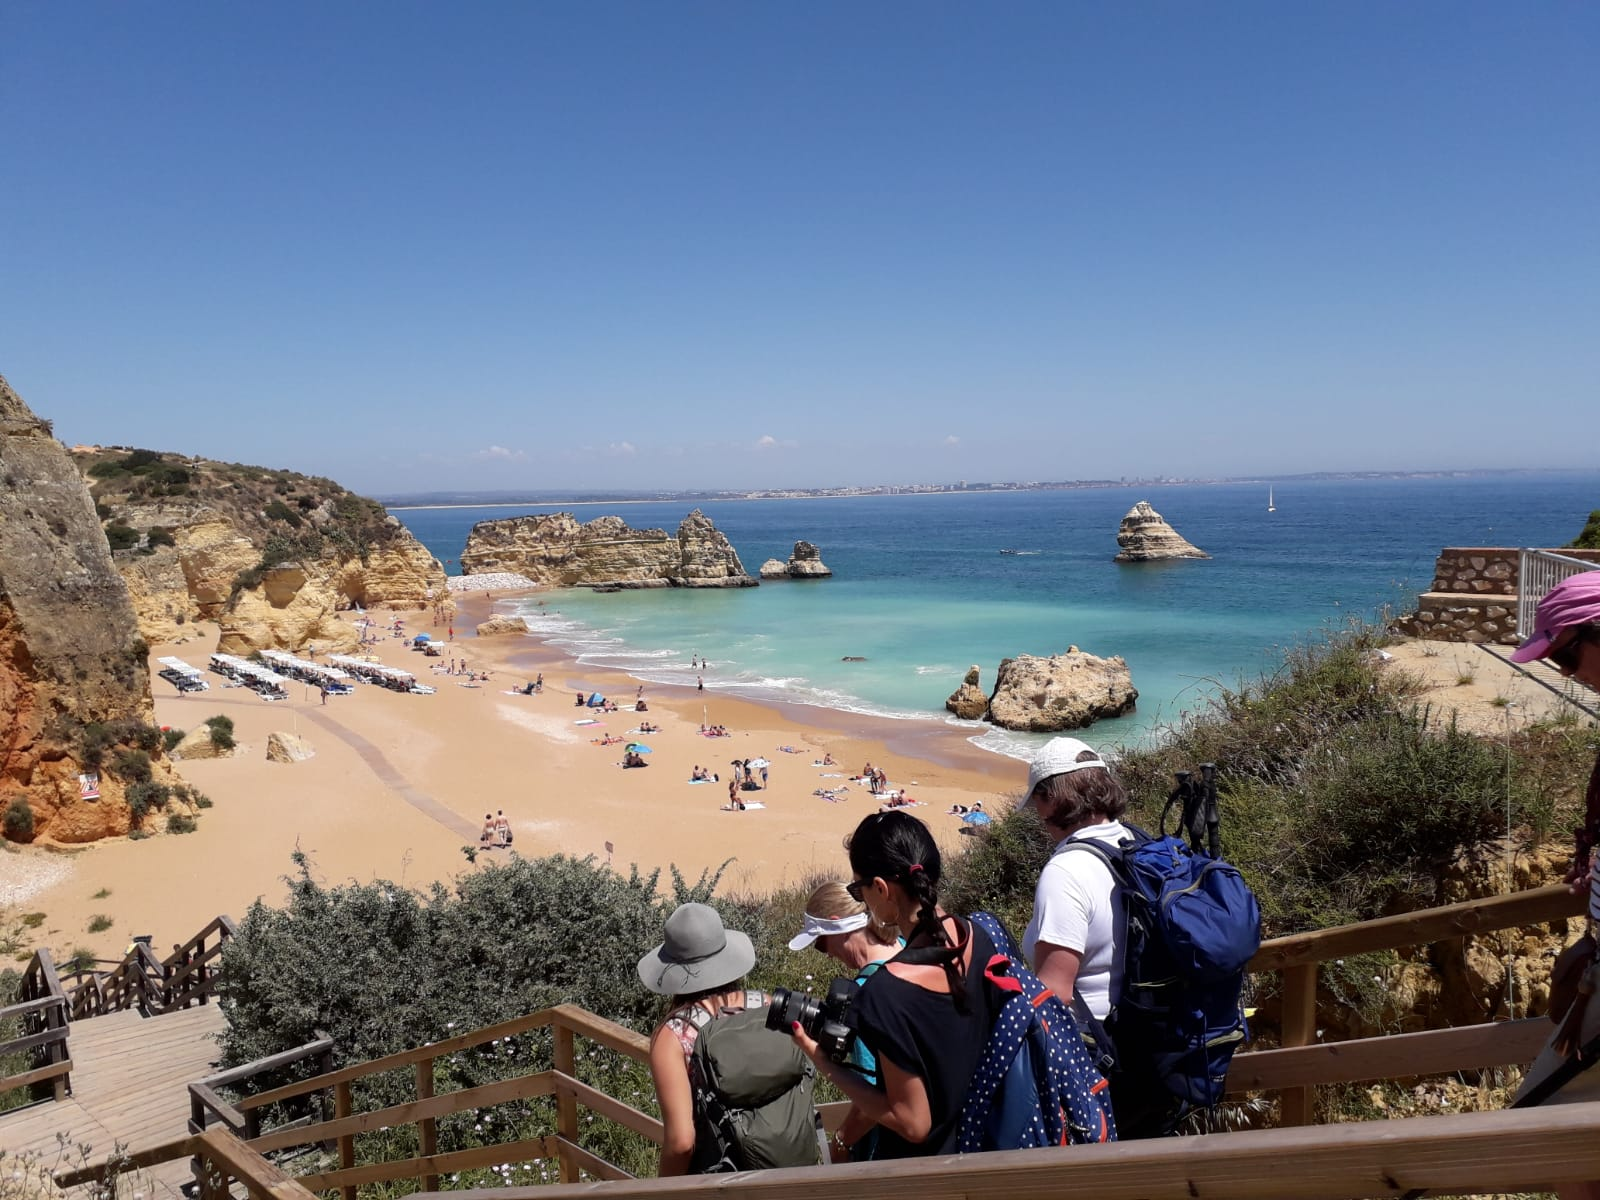 Neue Algarvereise im Oktober